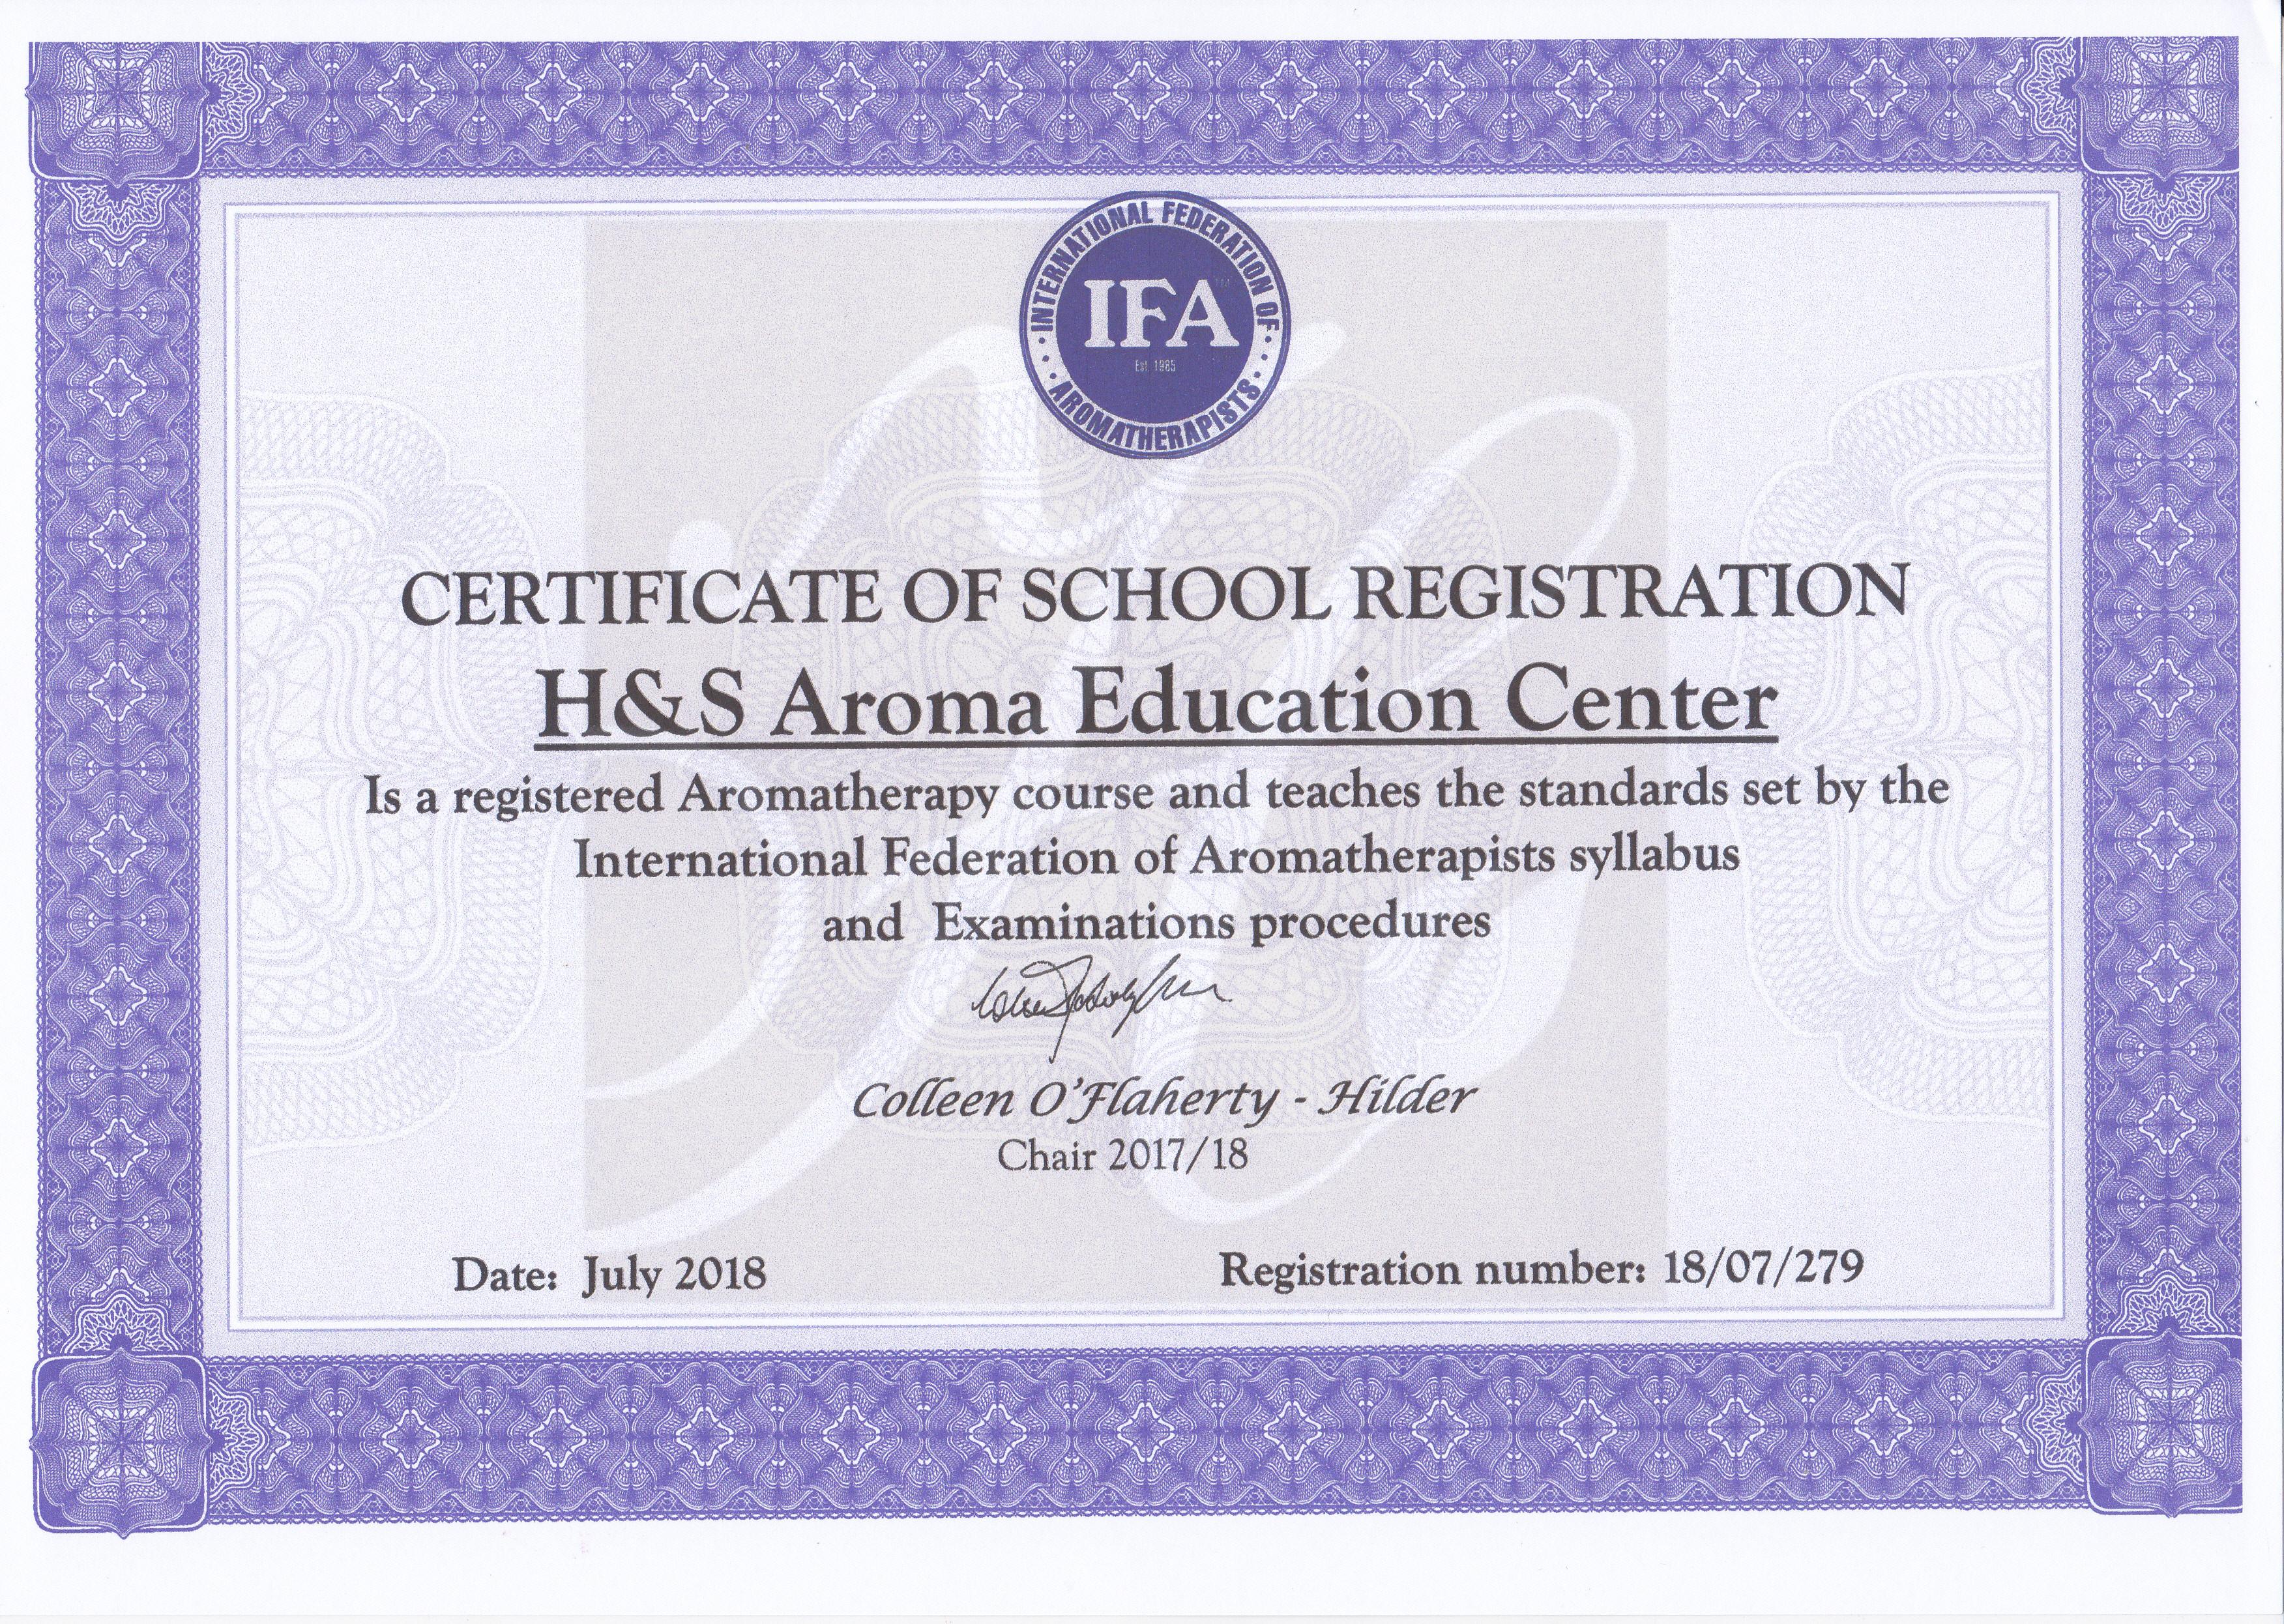 IFA认证培训学校